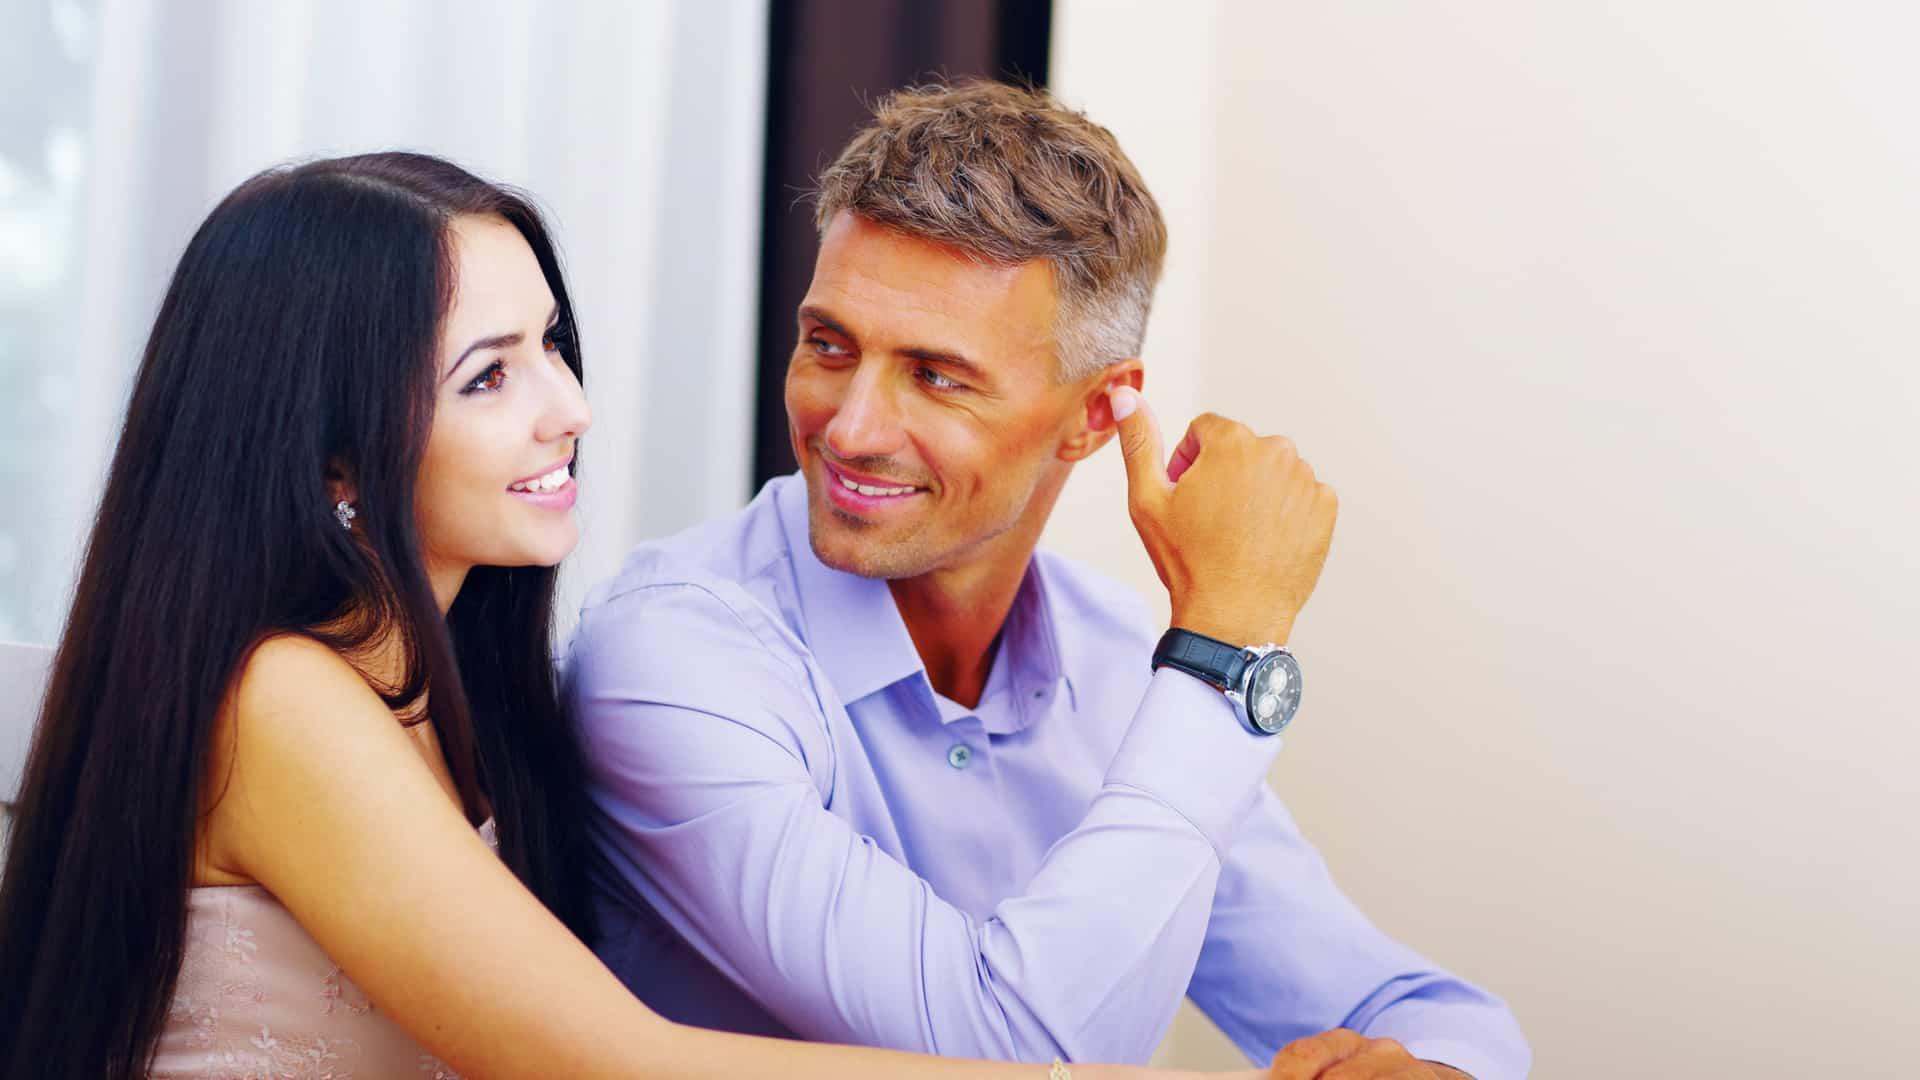 Mature dating customer service